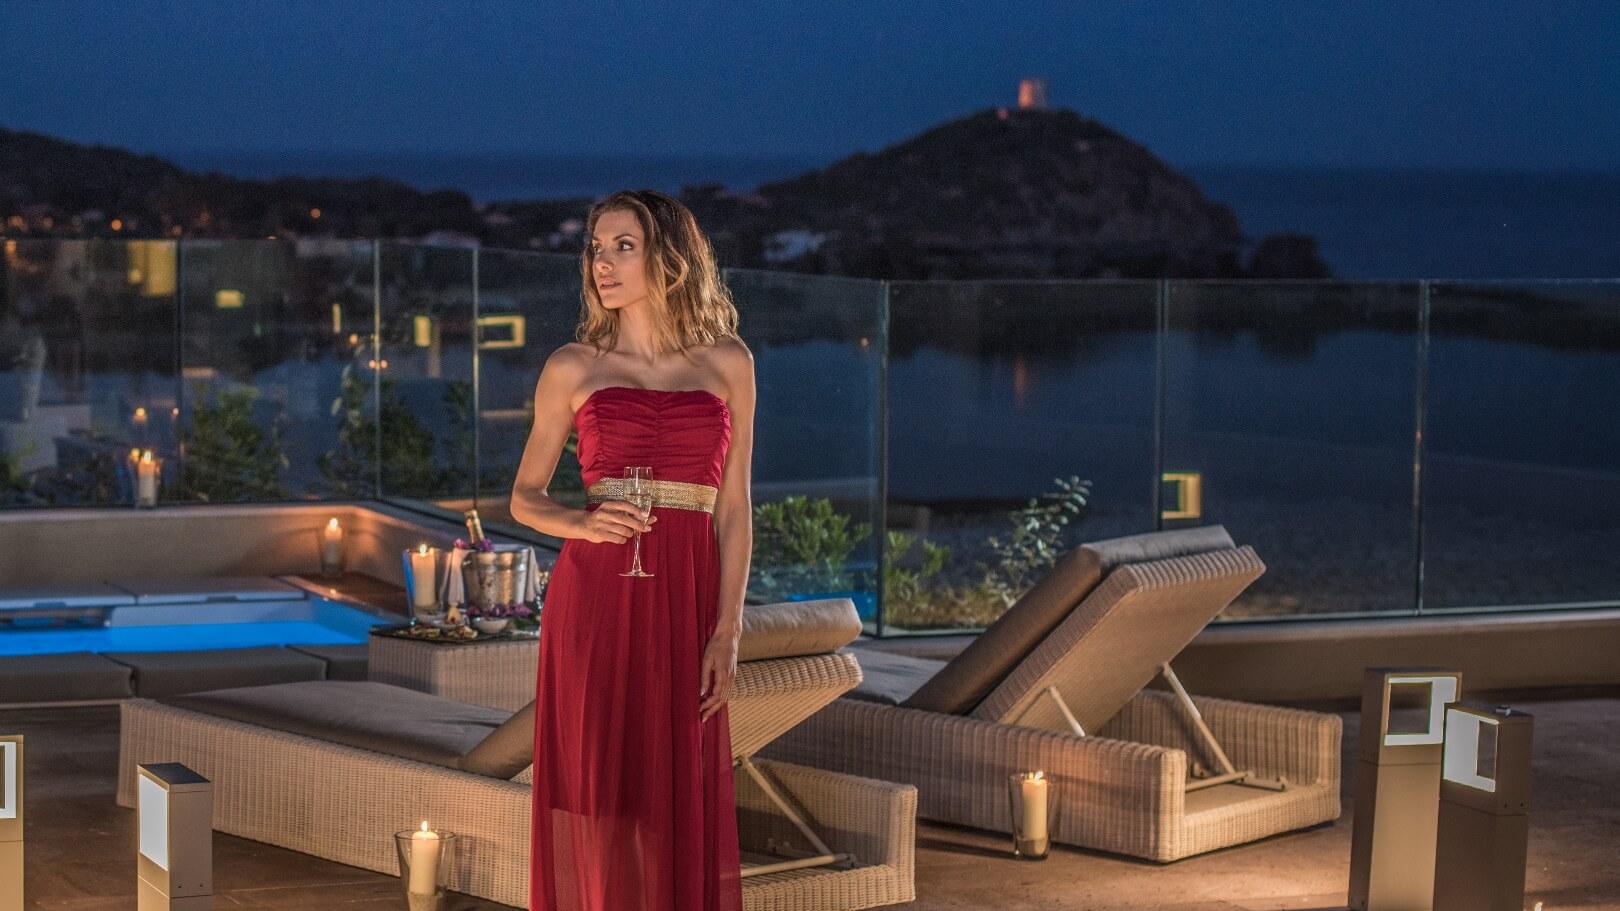 https://www.chialagunaresort.com/wp-content/uploads/2021/05/IHC_Chia-Laguna-Resort_grid_romantic_aperitif.jpg